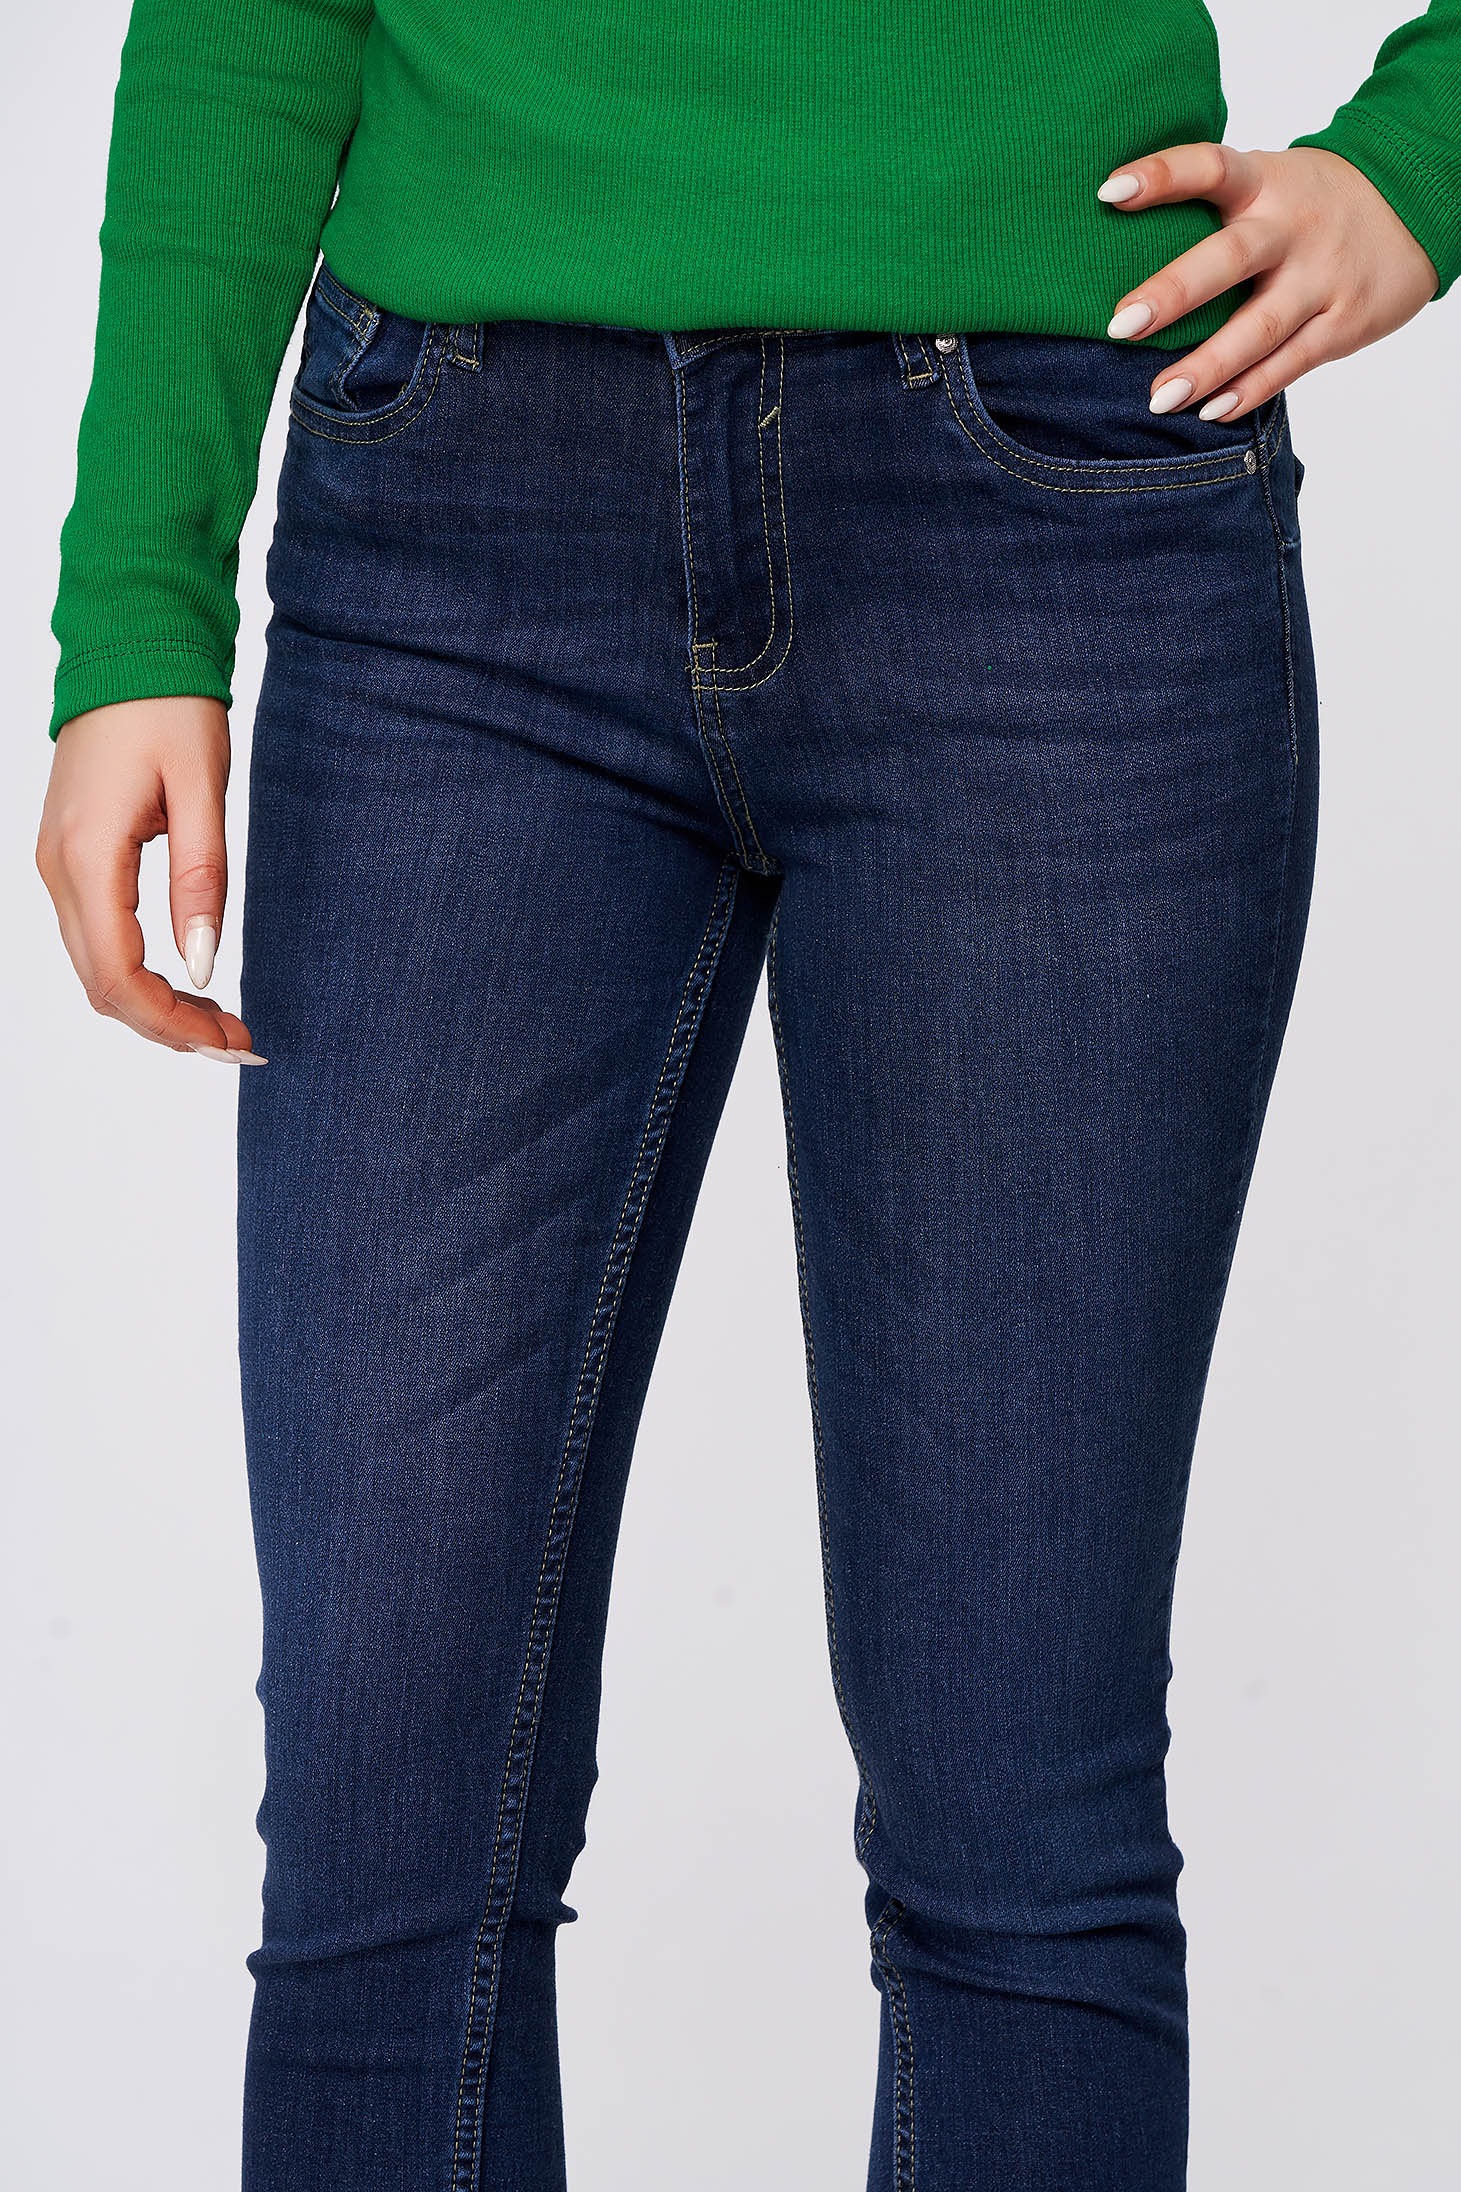 Darkblue jeans casual skinny jeans slightly elastic cotton with medium waist